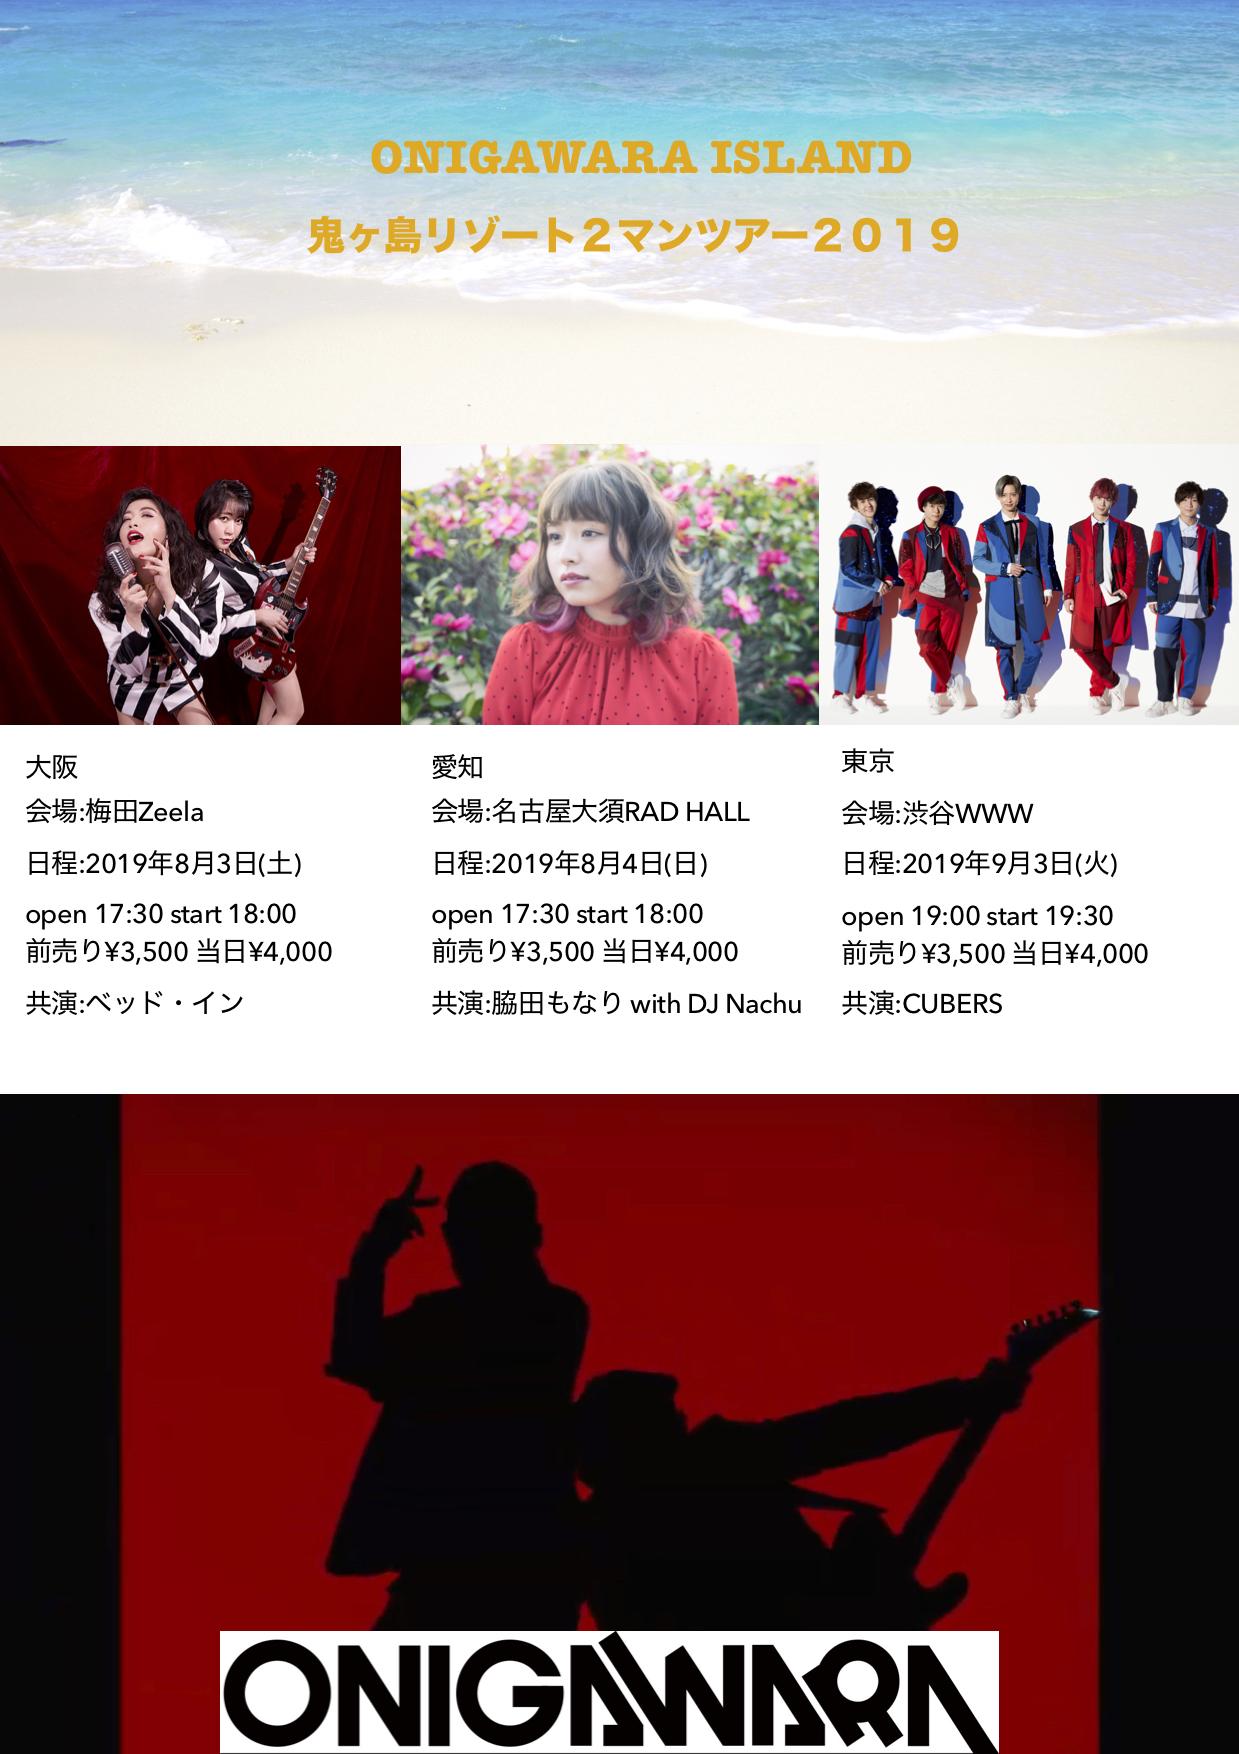 【LIVE】9月3日(火) 「ONIGAWARA ISLAND~鬼ヶ島リゾート2マンツアー2019~」 出演決定!